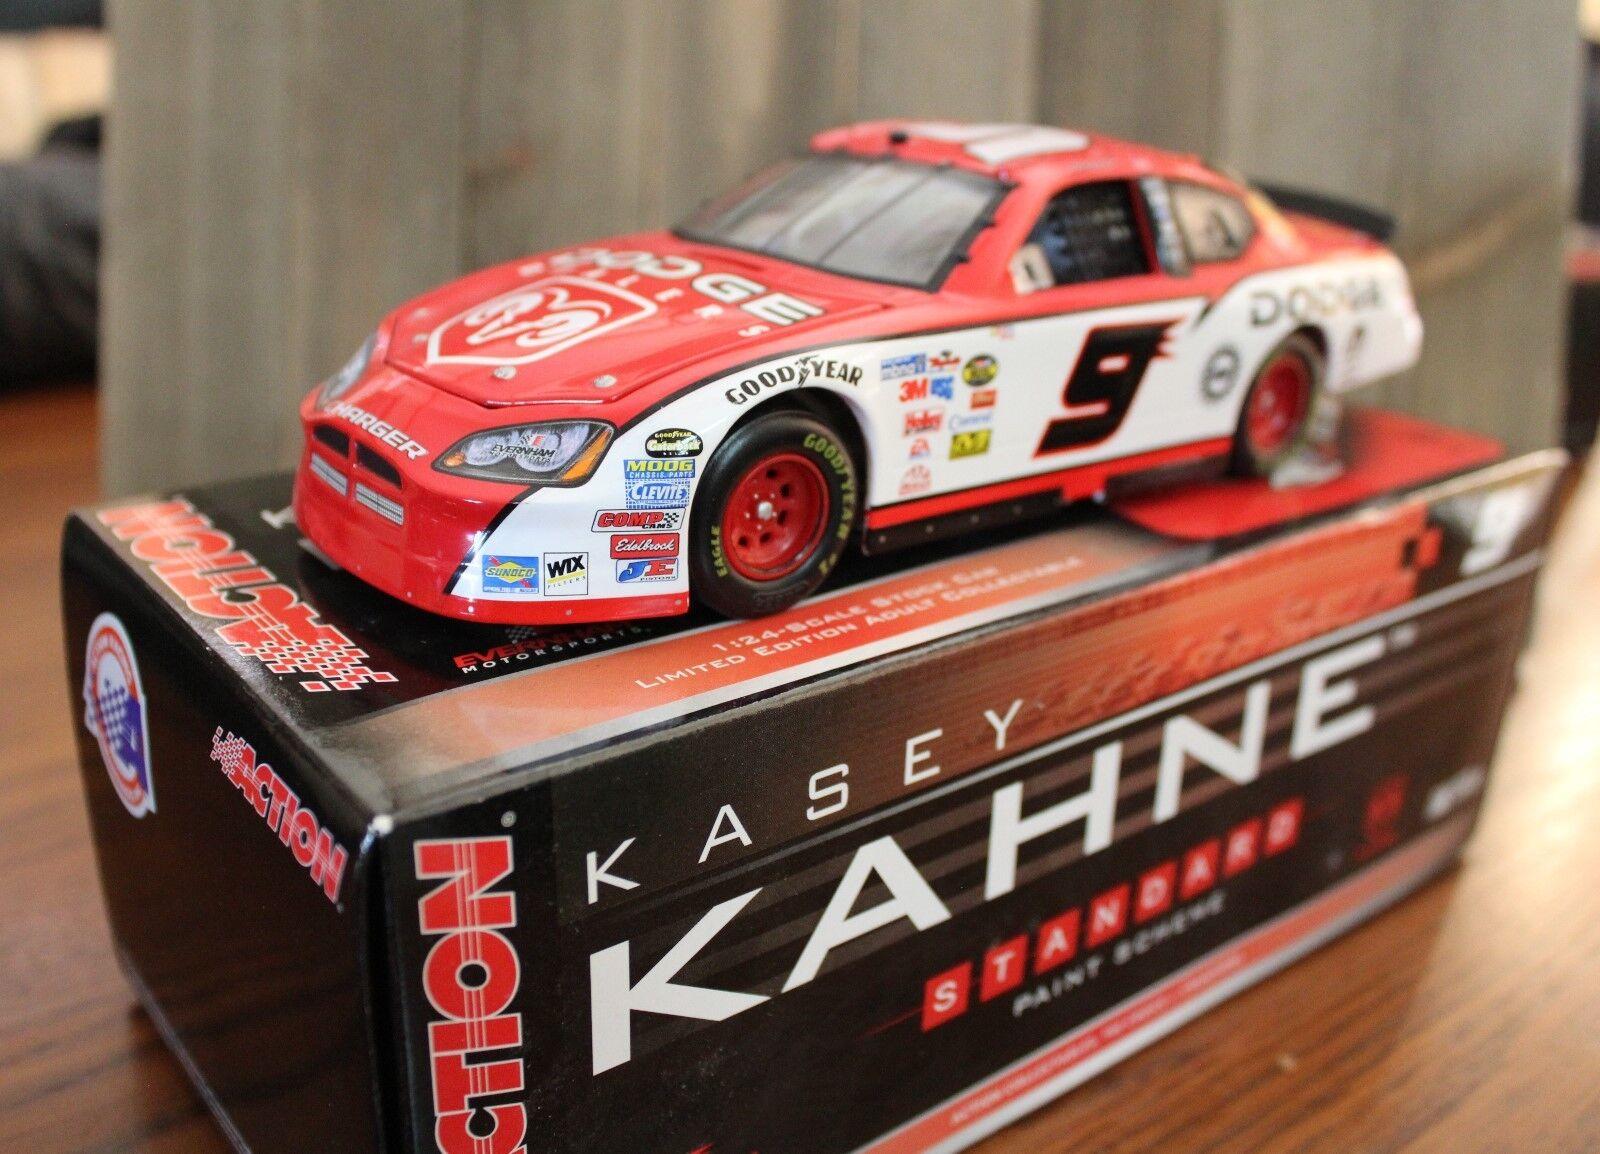 Kasey Kahne, Dodge Dealers, 2006 Charger, 1 24 scale